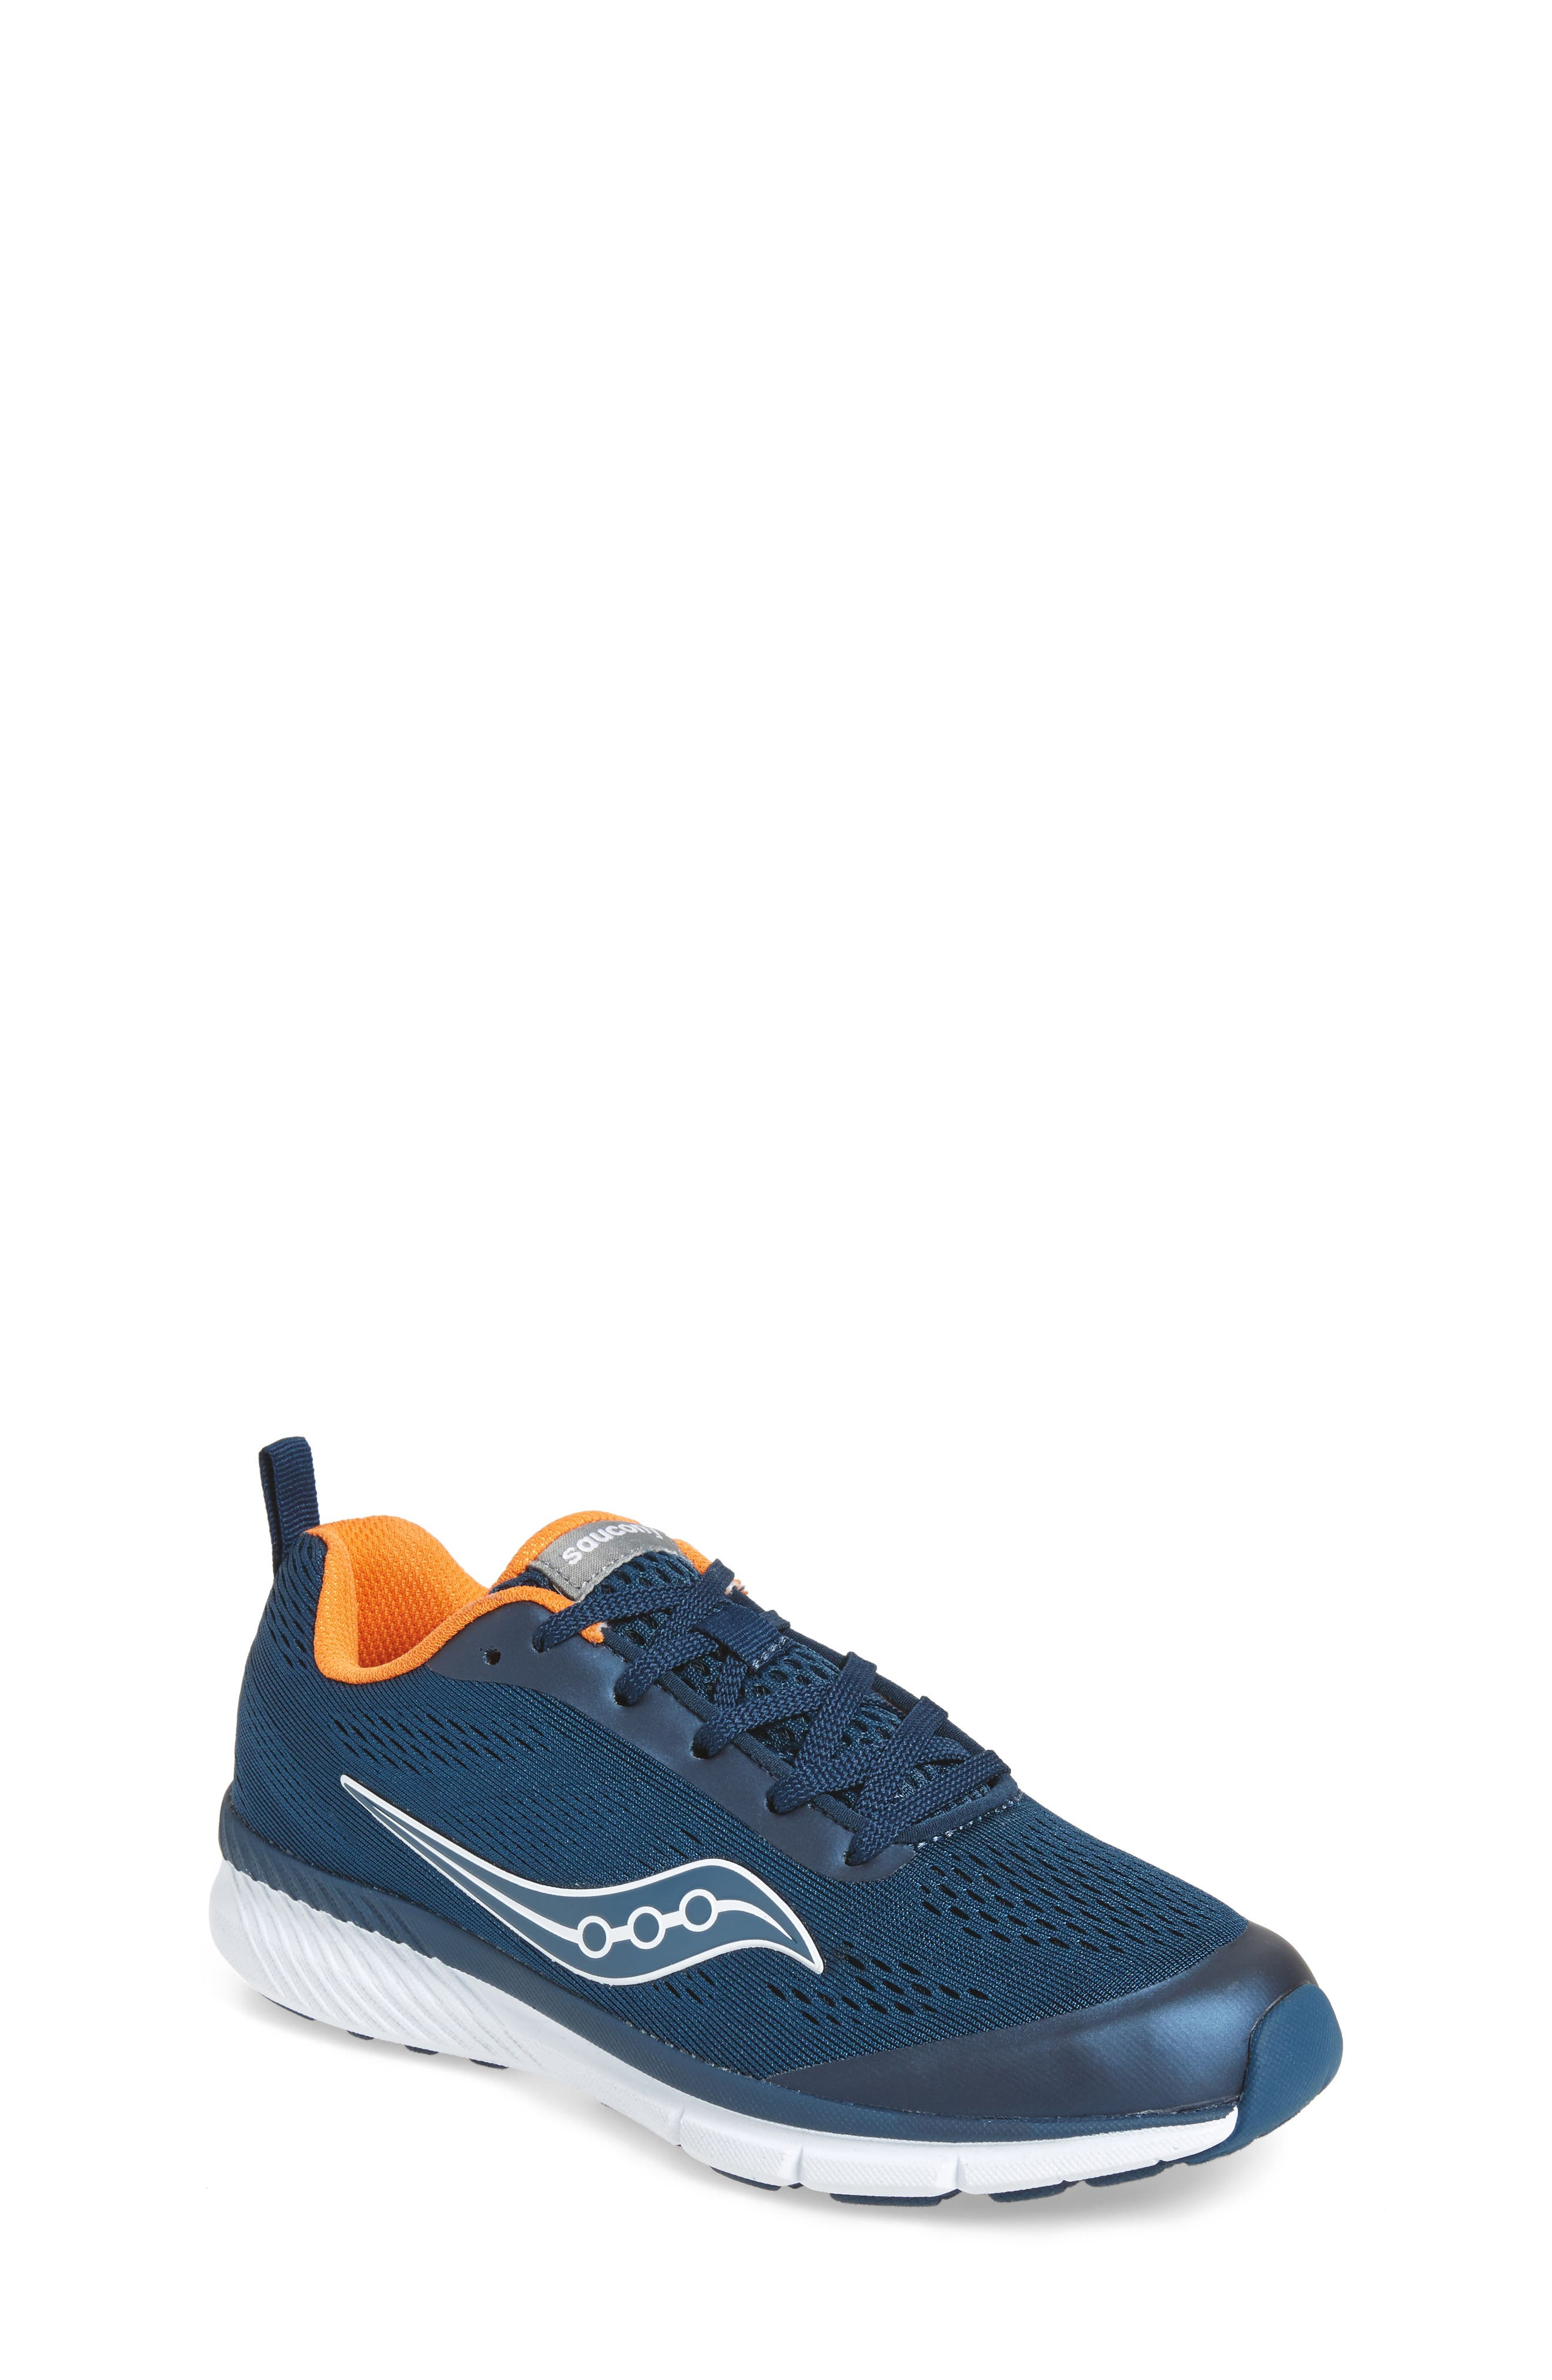 Main Image - Saucony Ideal Sneaker (Toddler, Little Kid & Big Kid)